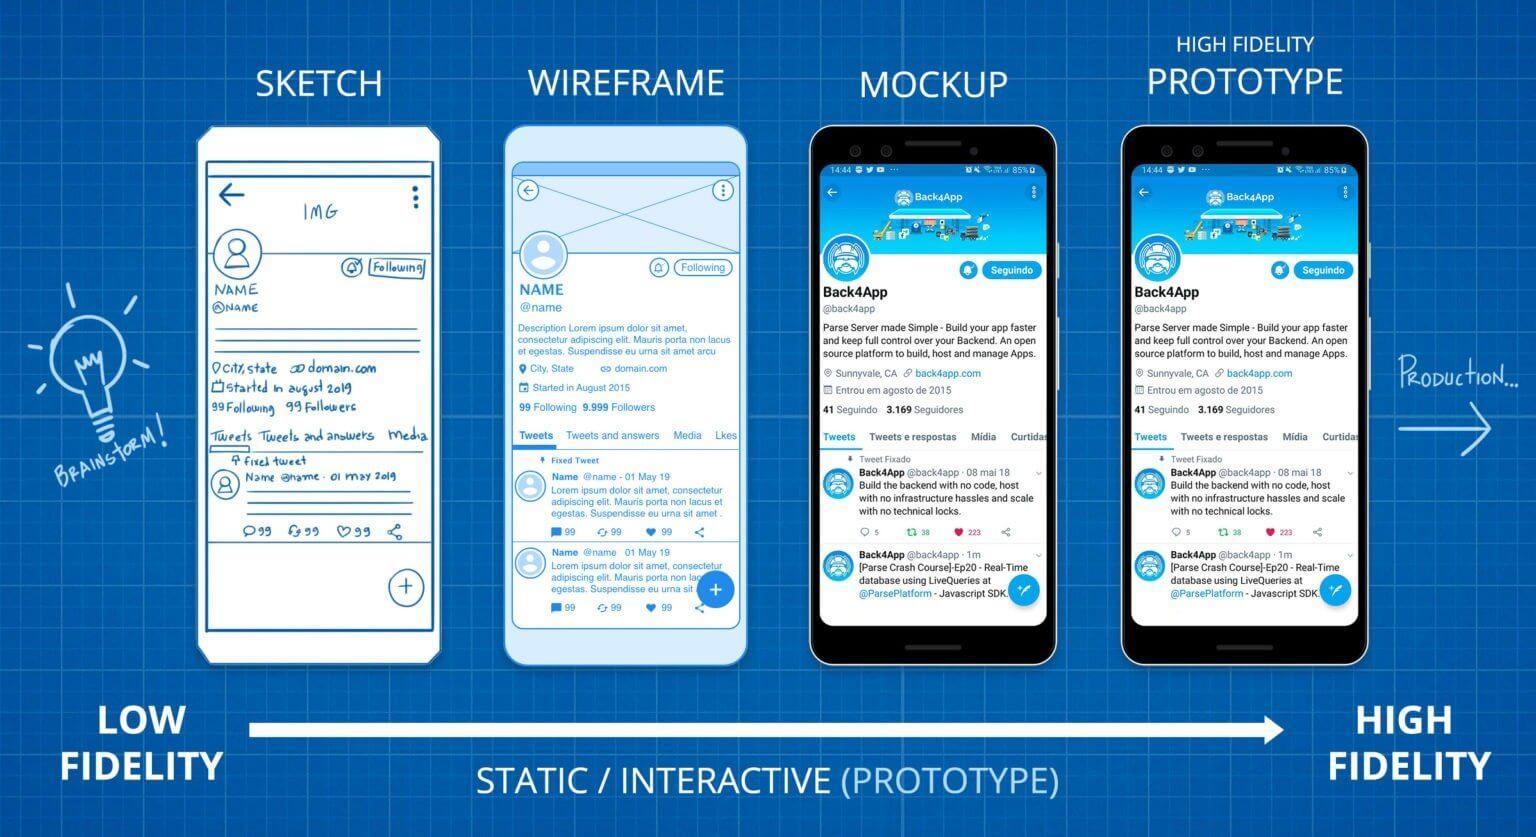 wireframe-mockup-prototype